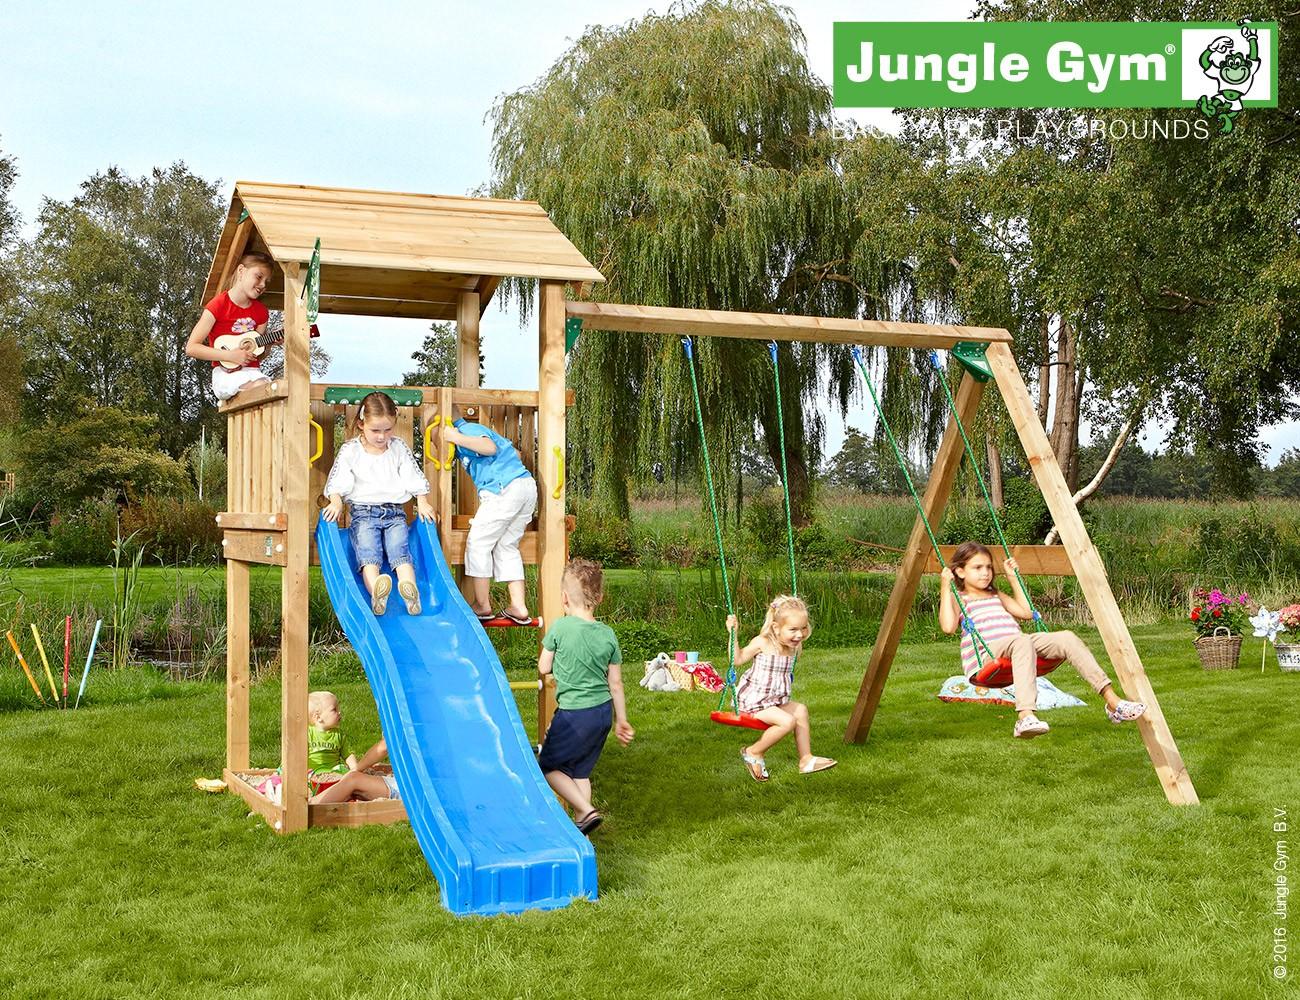 jungle gym jasons casa spielturm set mit schaukel rutsche sandkasten holzturm. Black Bedroom Furniture Sets. Home Design Ideas